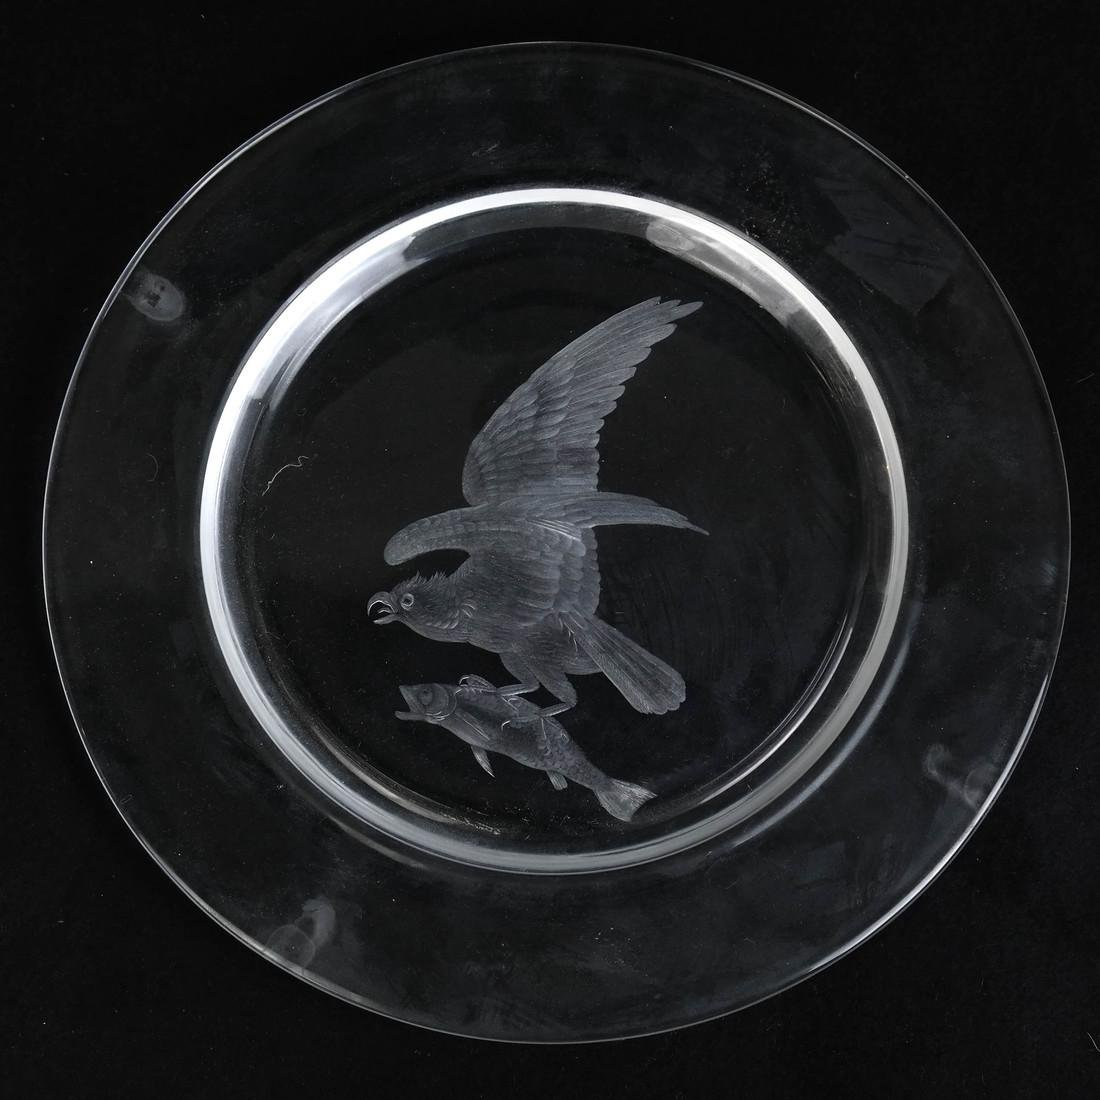 Steuben Glass Plate